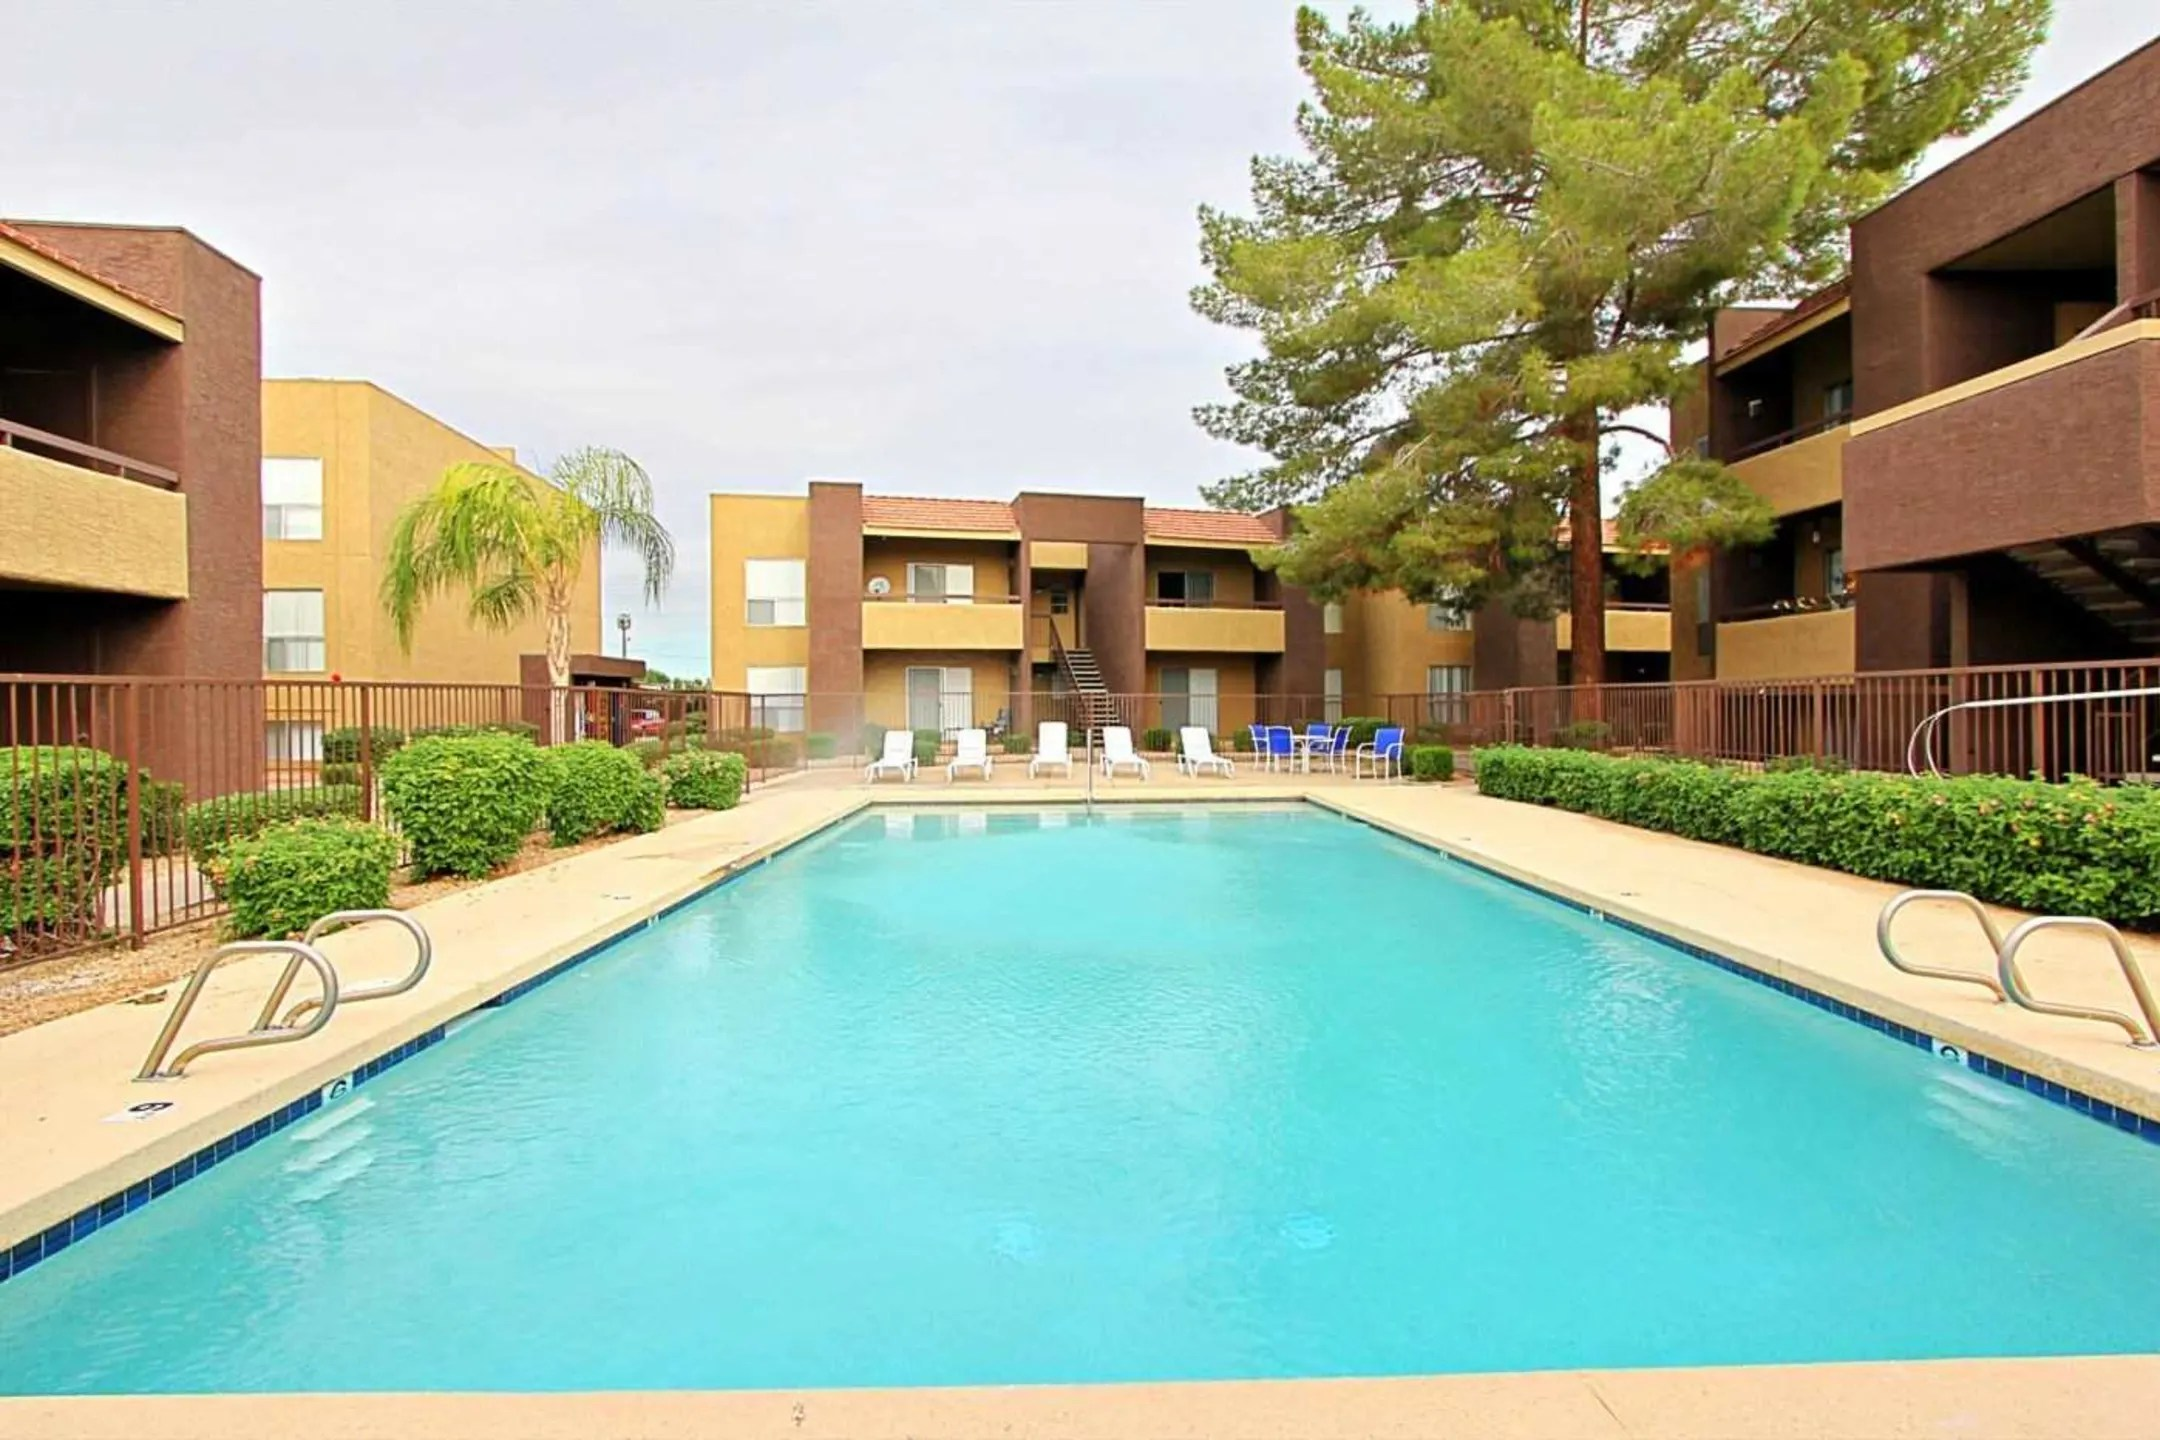 Villa Serena Apartments  Phoenix AZ 85051